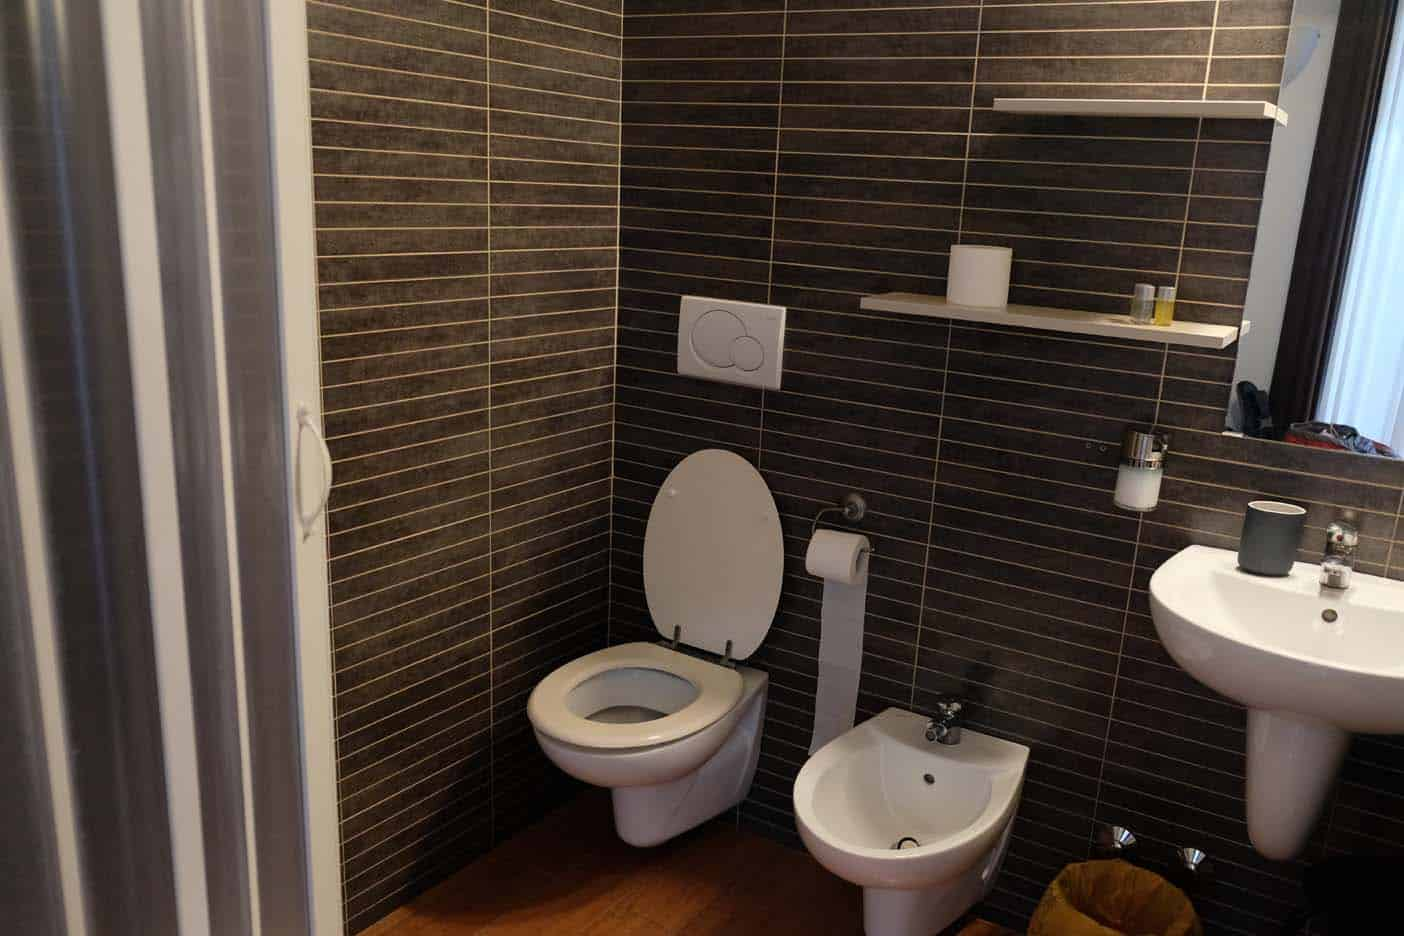 rome kindvriendelijk hotel